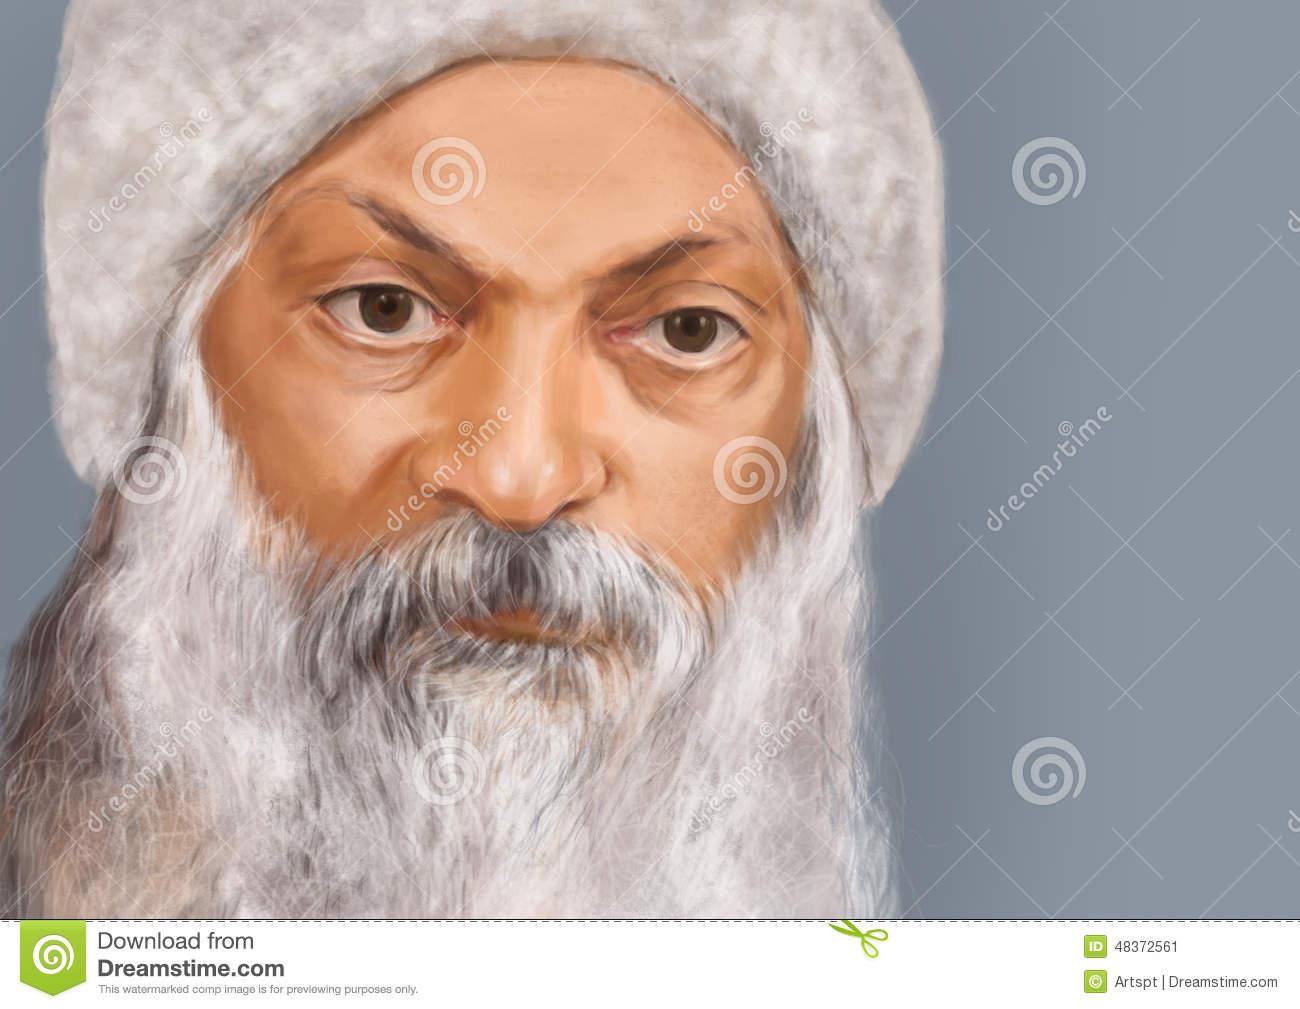 portrait-eldery-man-representing-wisdom-tiff-format-available-removing-background-48372561[1]